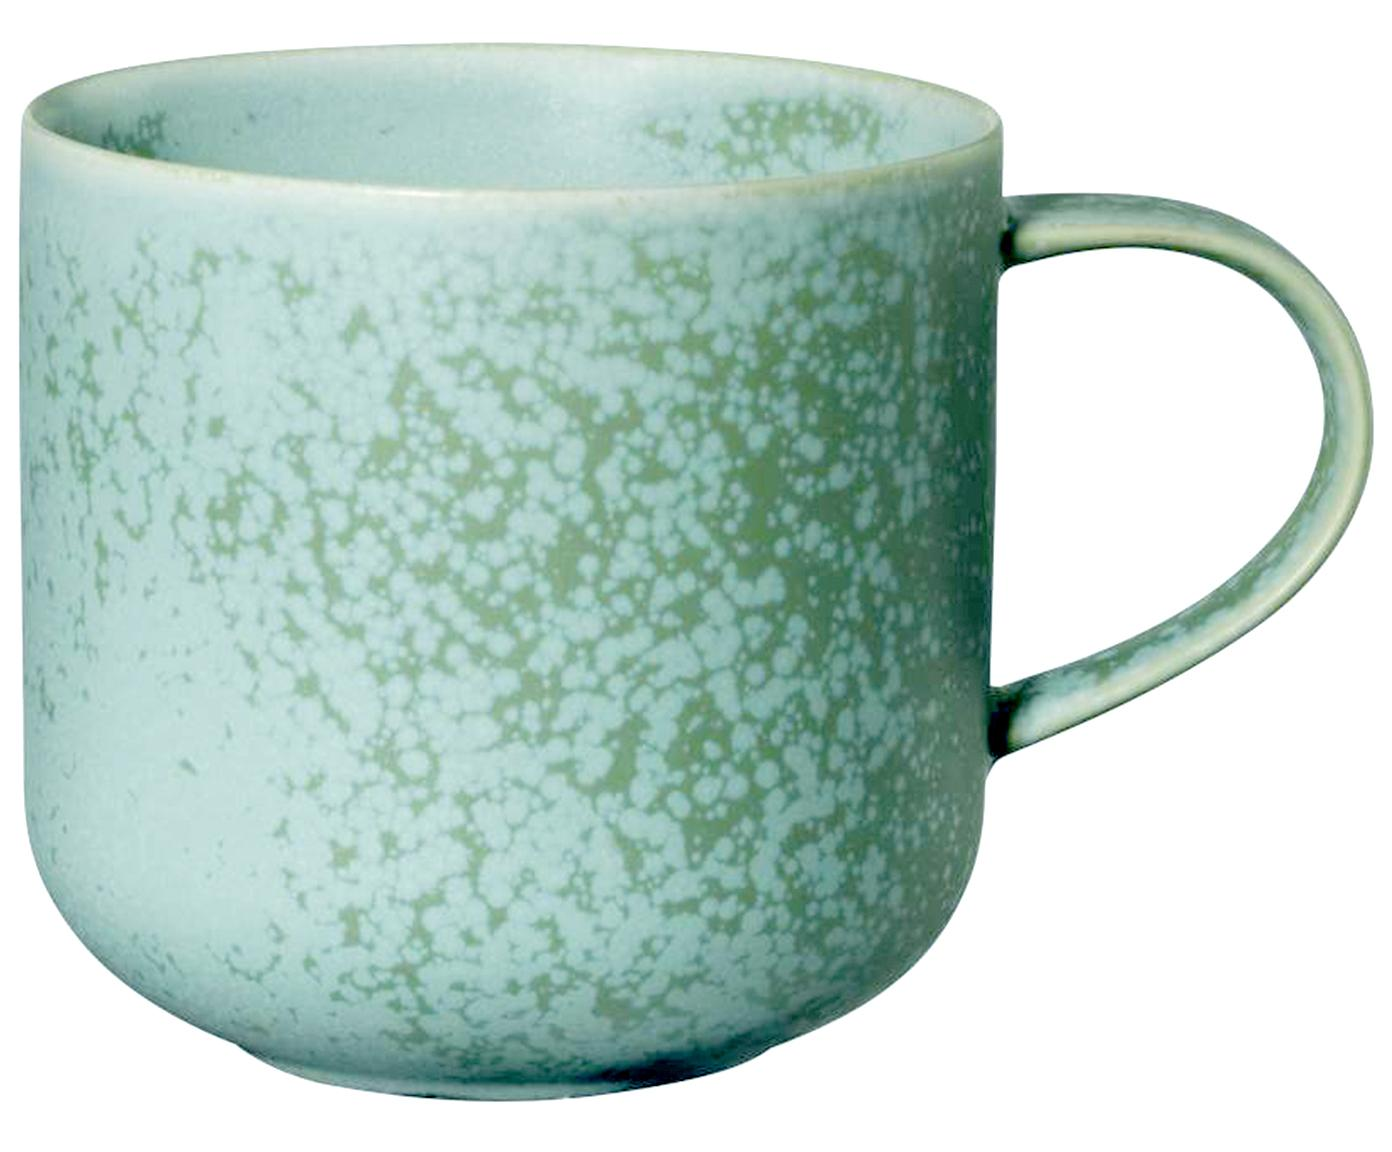 Handgefertigte Tassen Coppa in Mintgrün gesprenkelt, 2 Stück, Porzellan, Mintgrüntöne, 400 ml